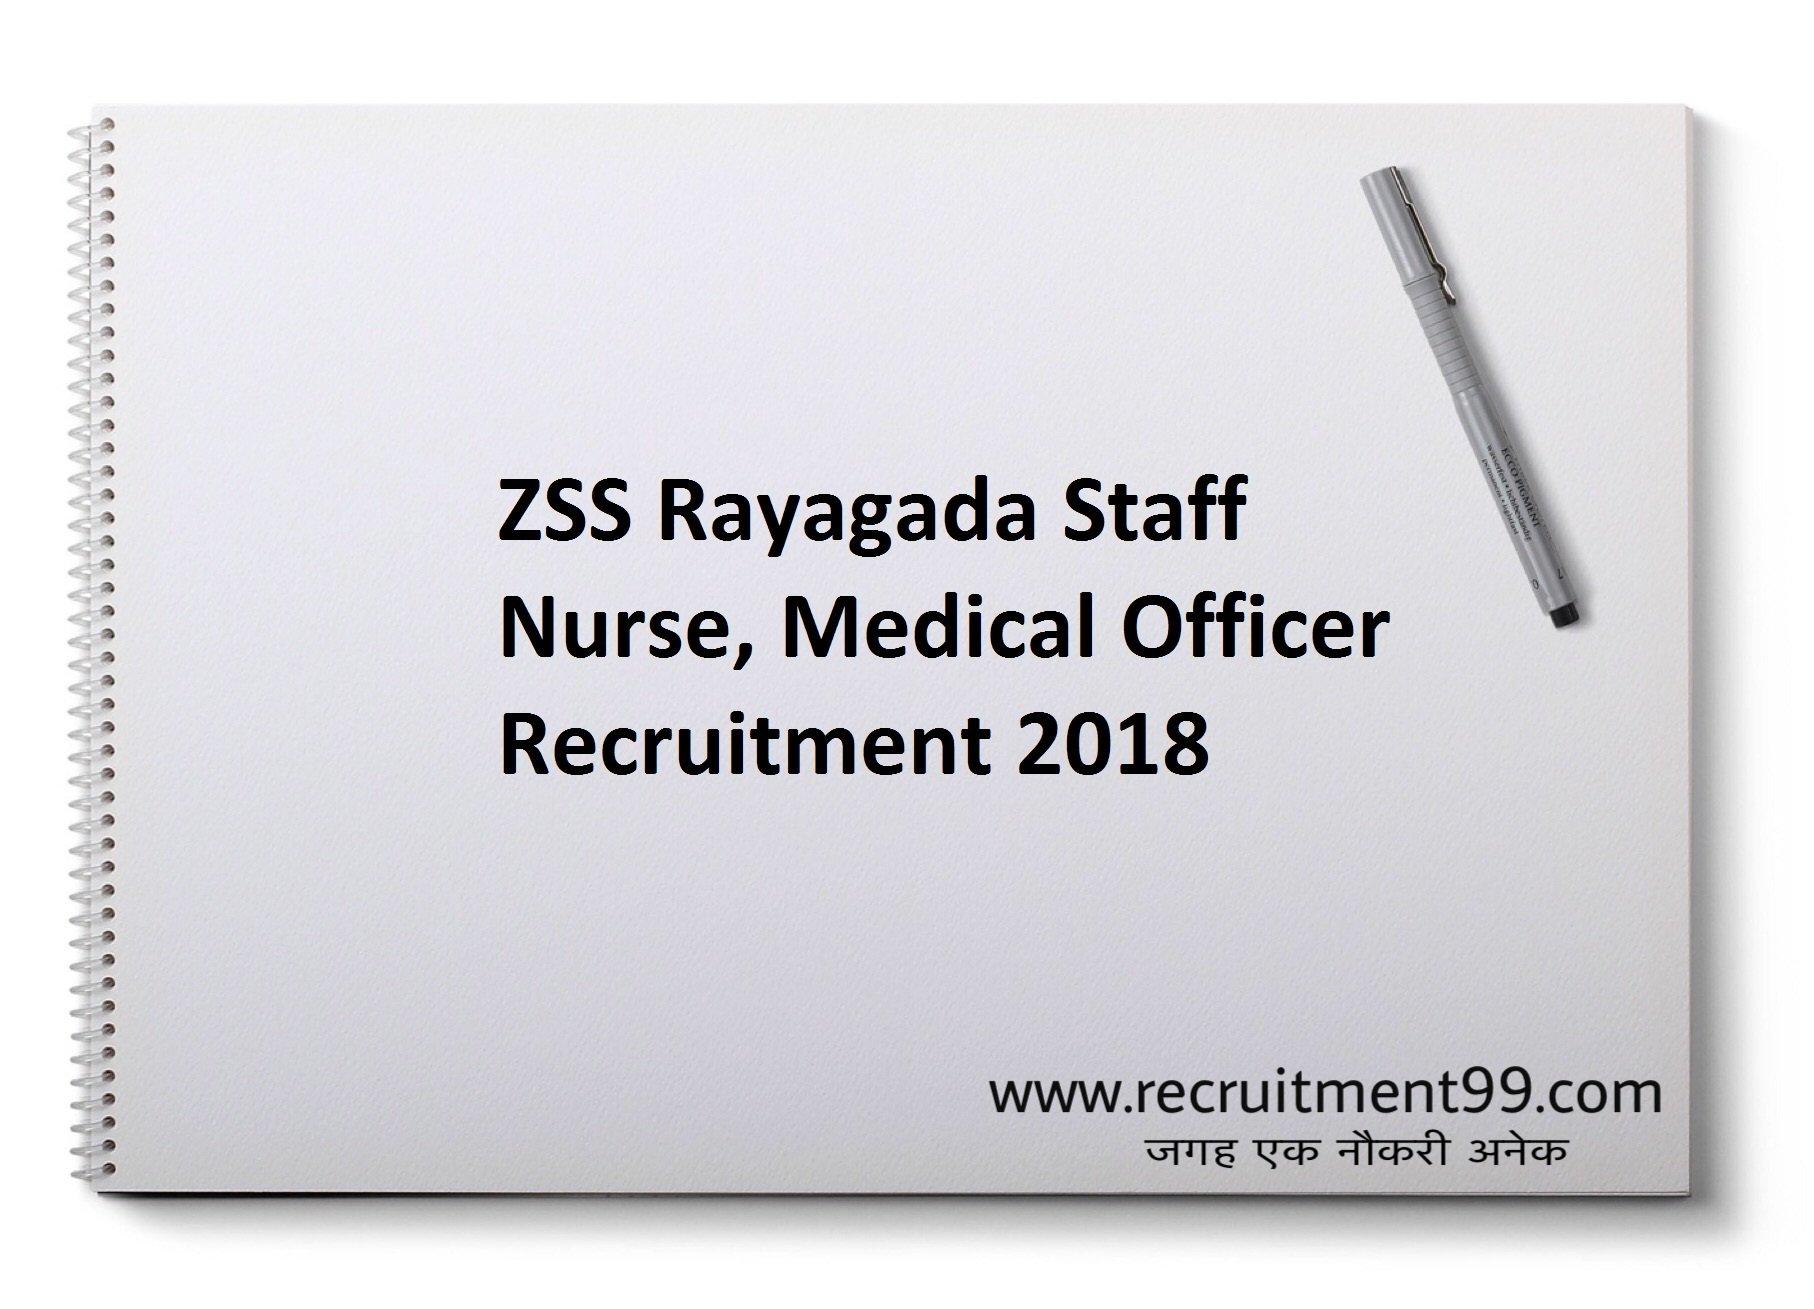 ZSS Rayagada Staff Nurse Medical Officer Recruitment Admit Card Result 2018